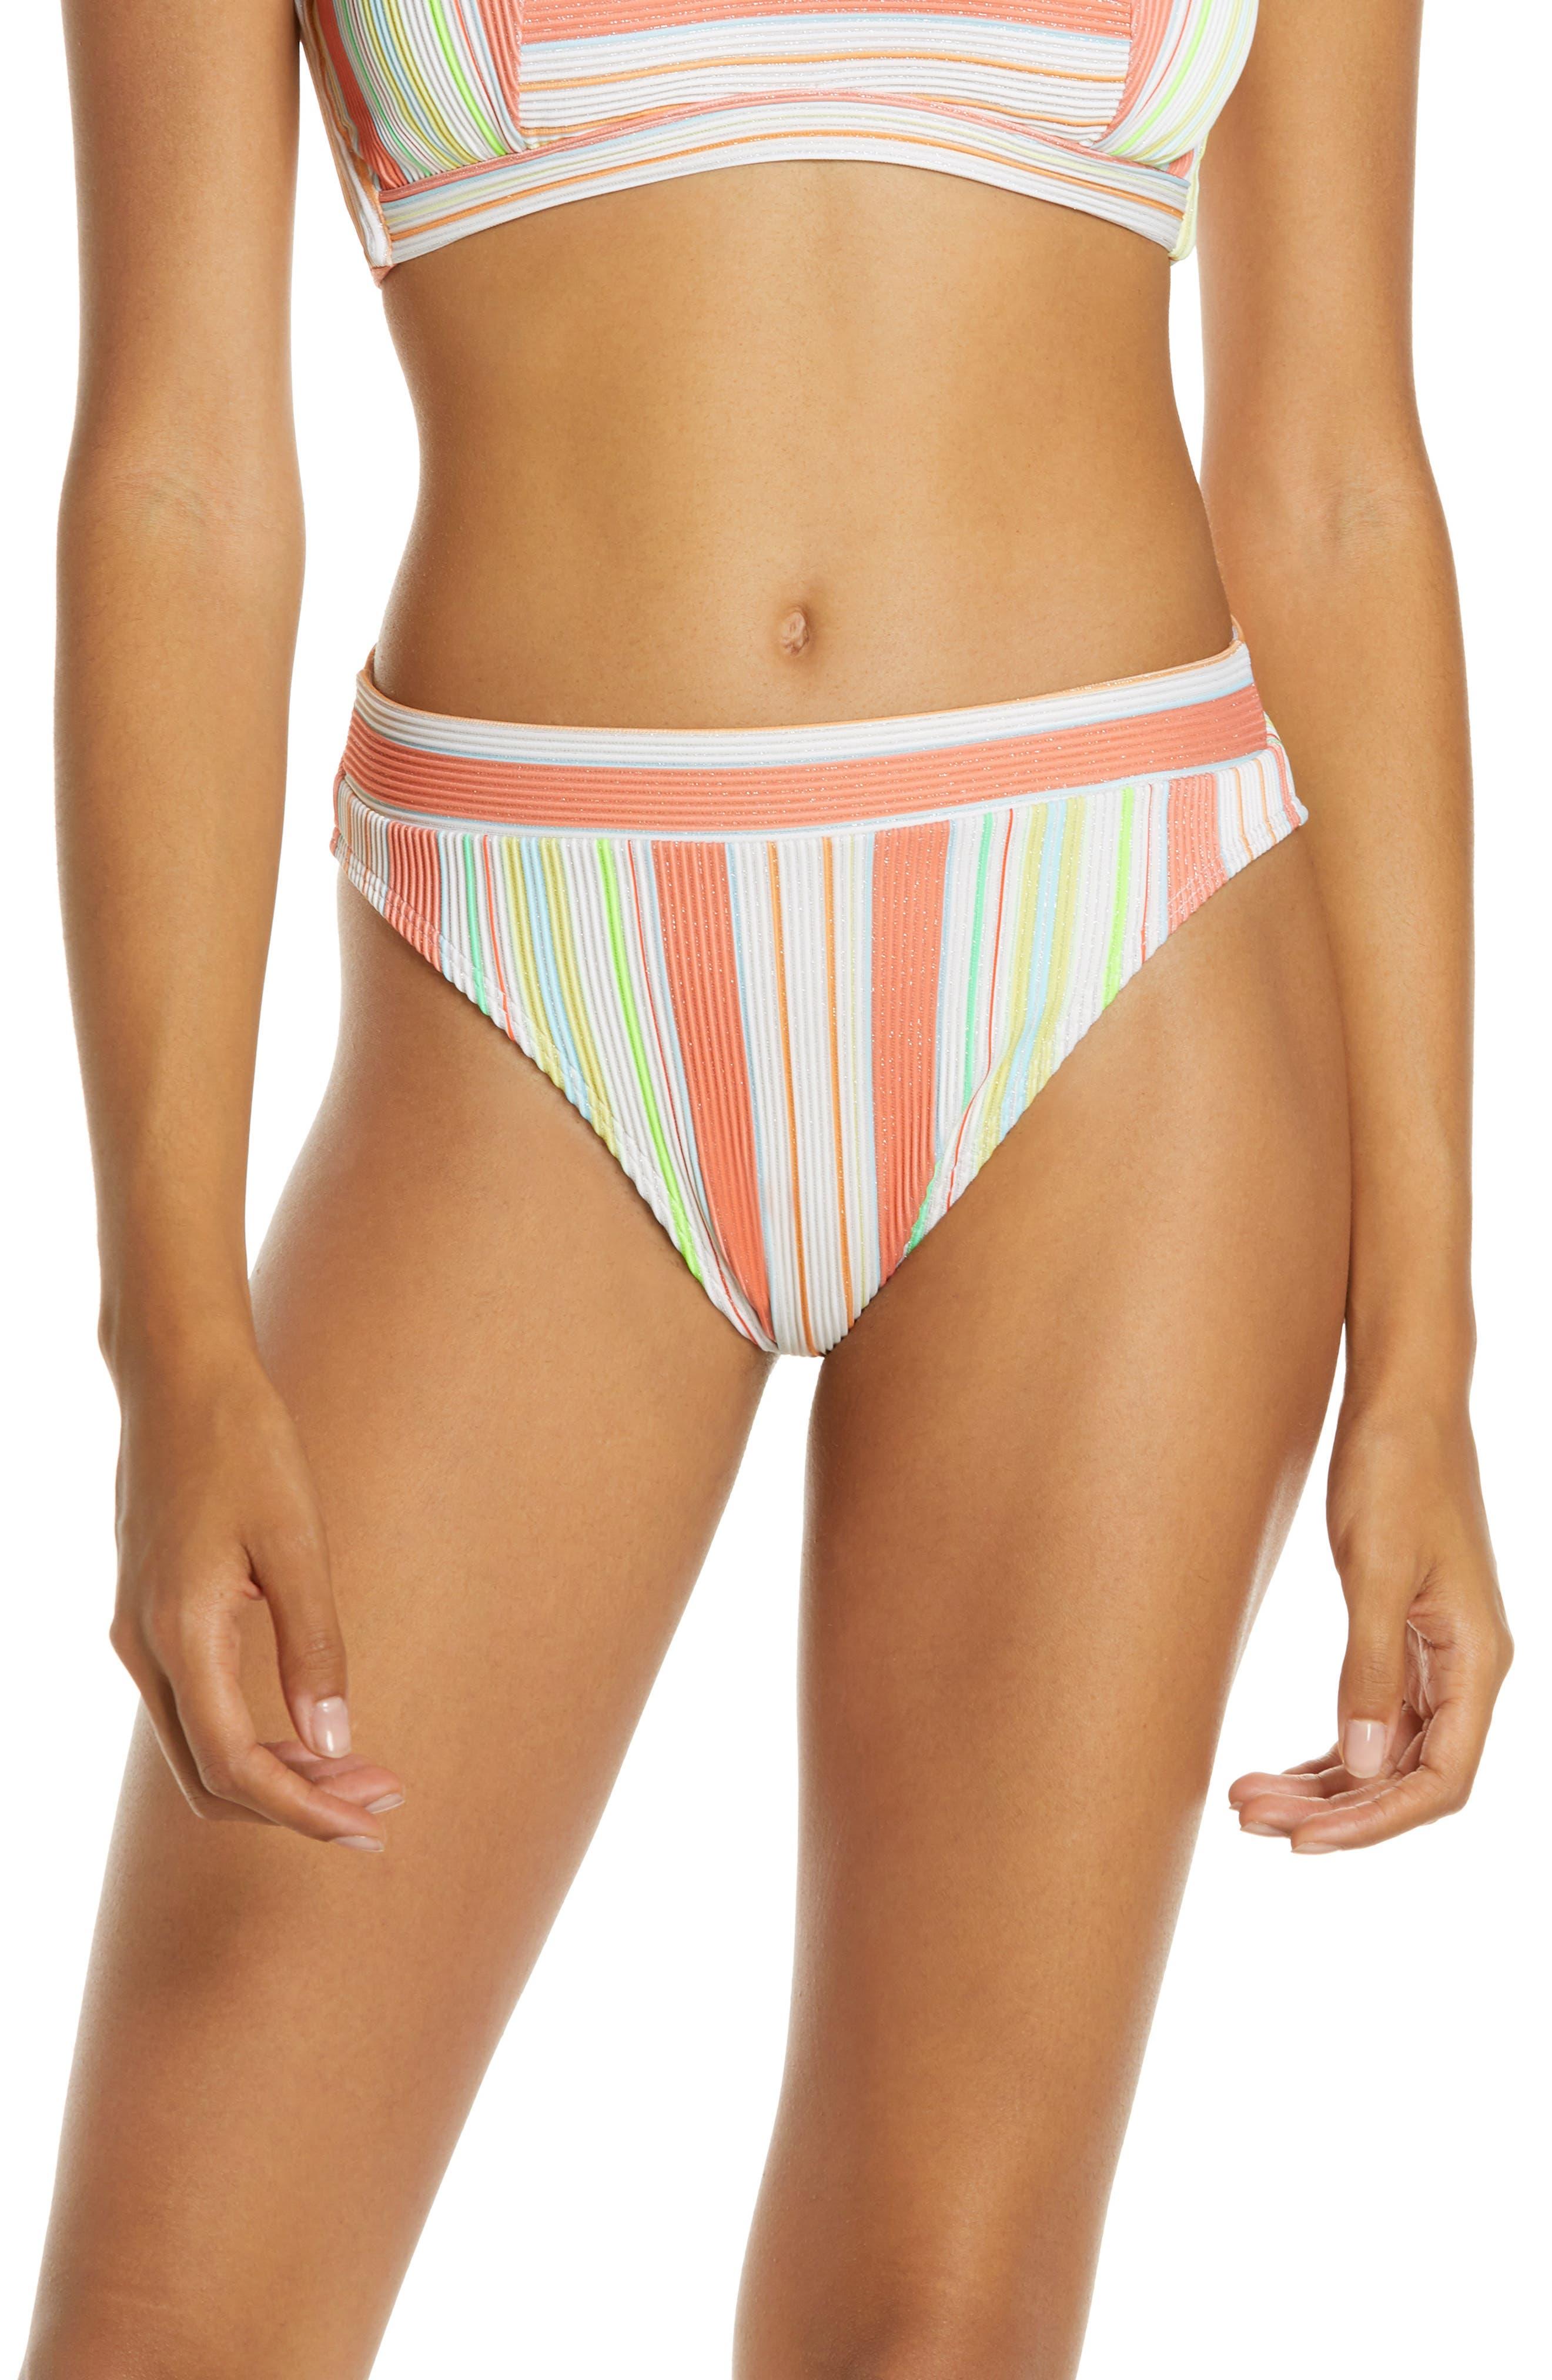 Luli Fama Playtime Bikini Bottoms, White